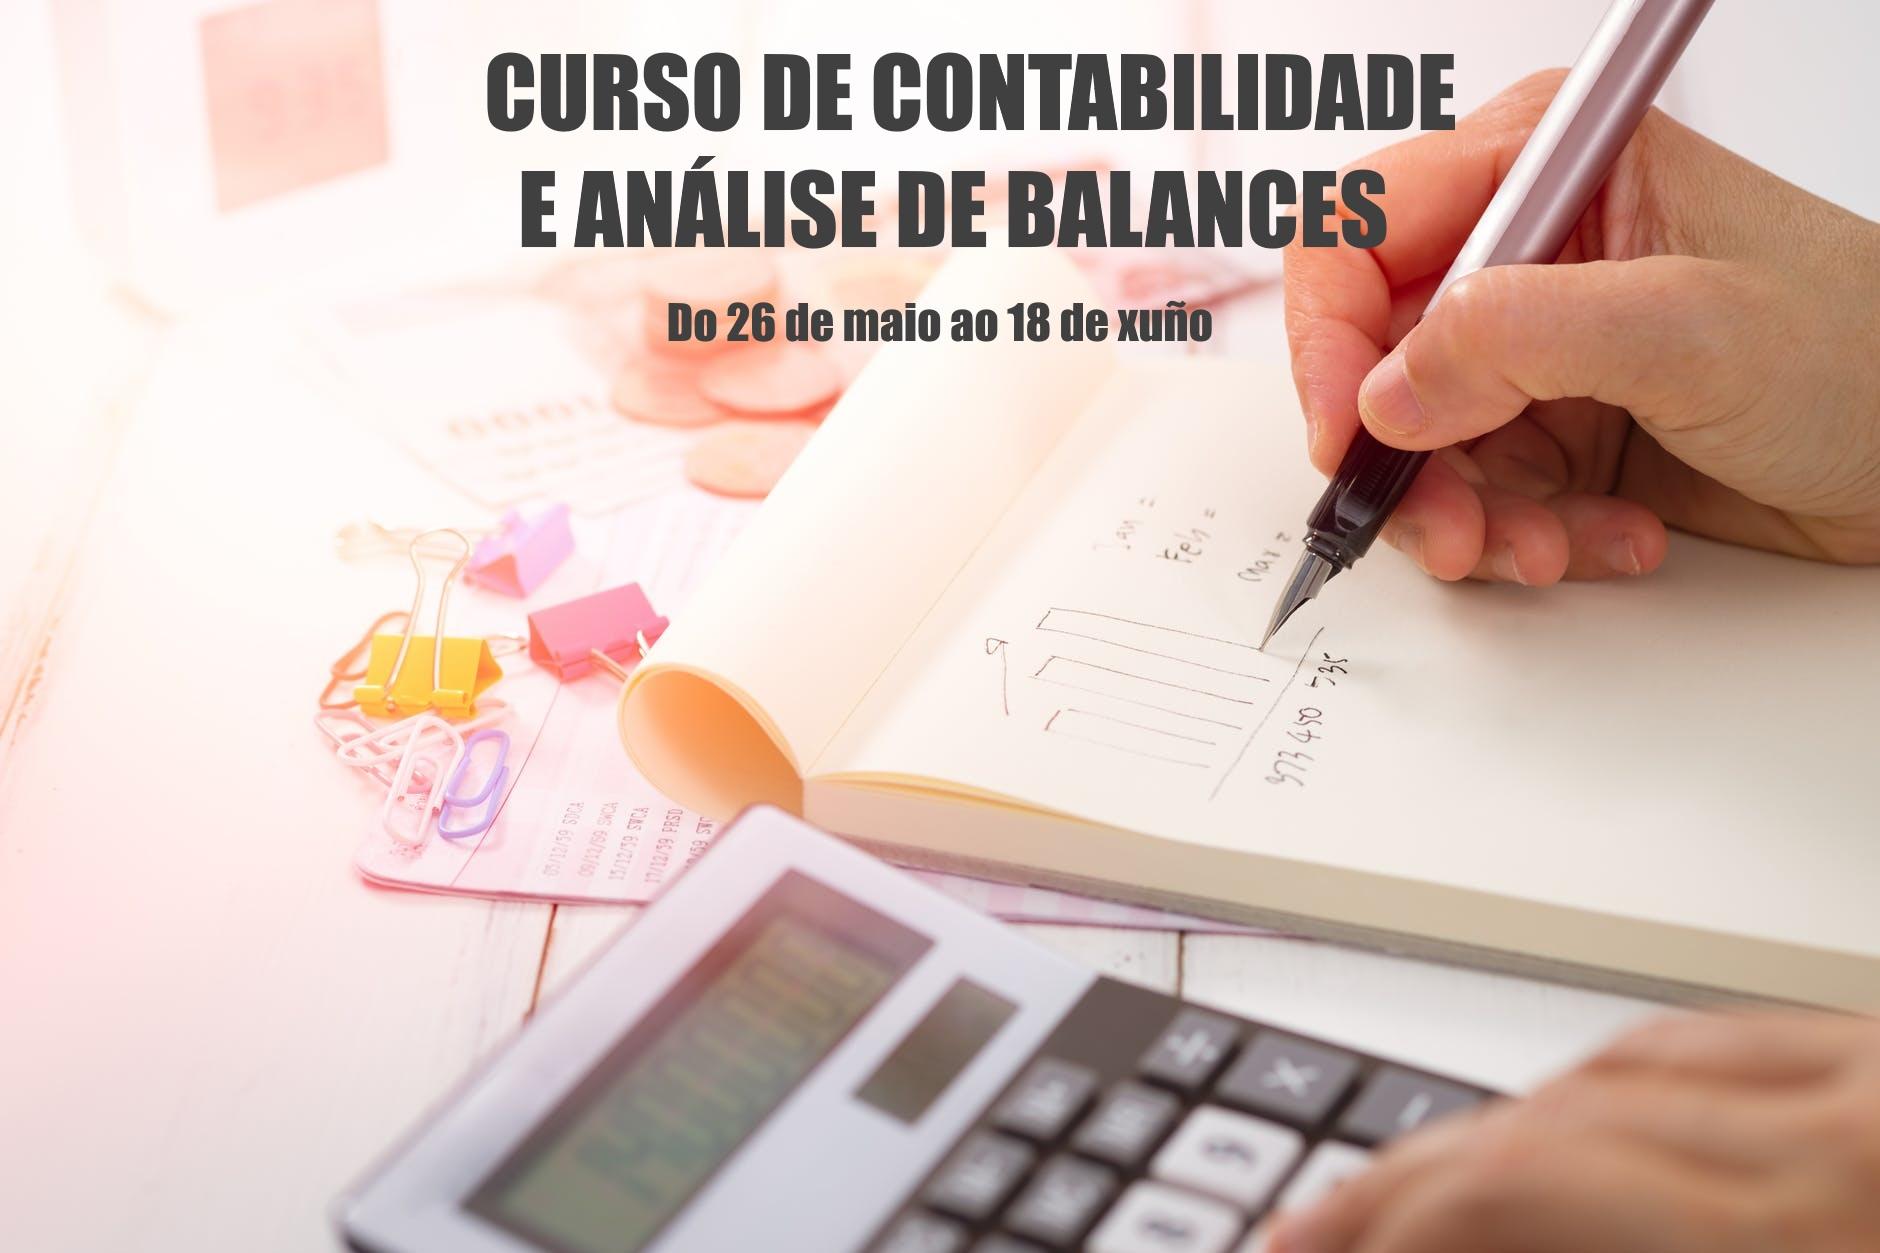 CURSO CONTABILIDADE E ANÁLISE DE BALANCES